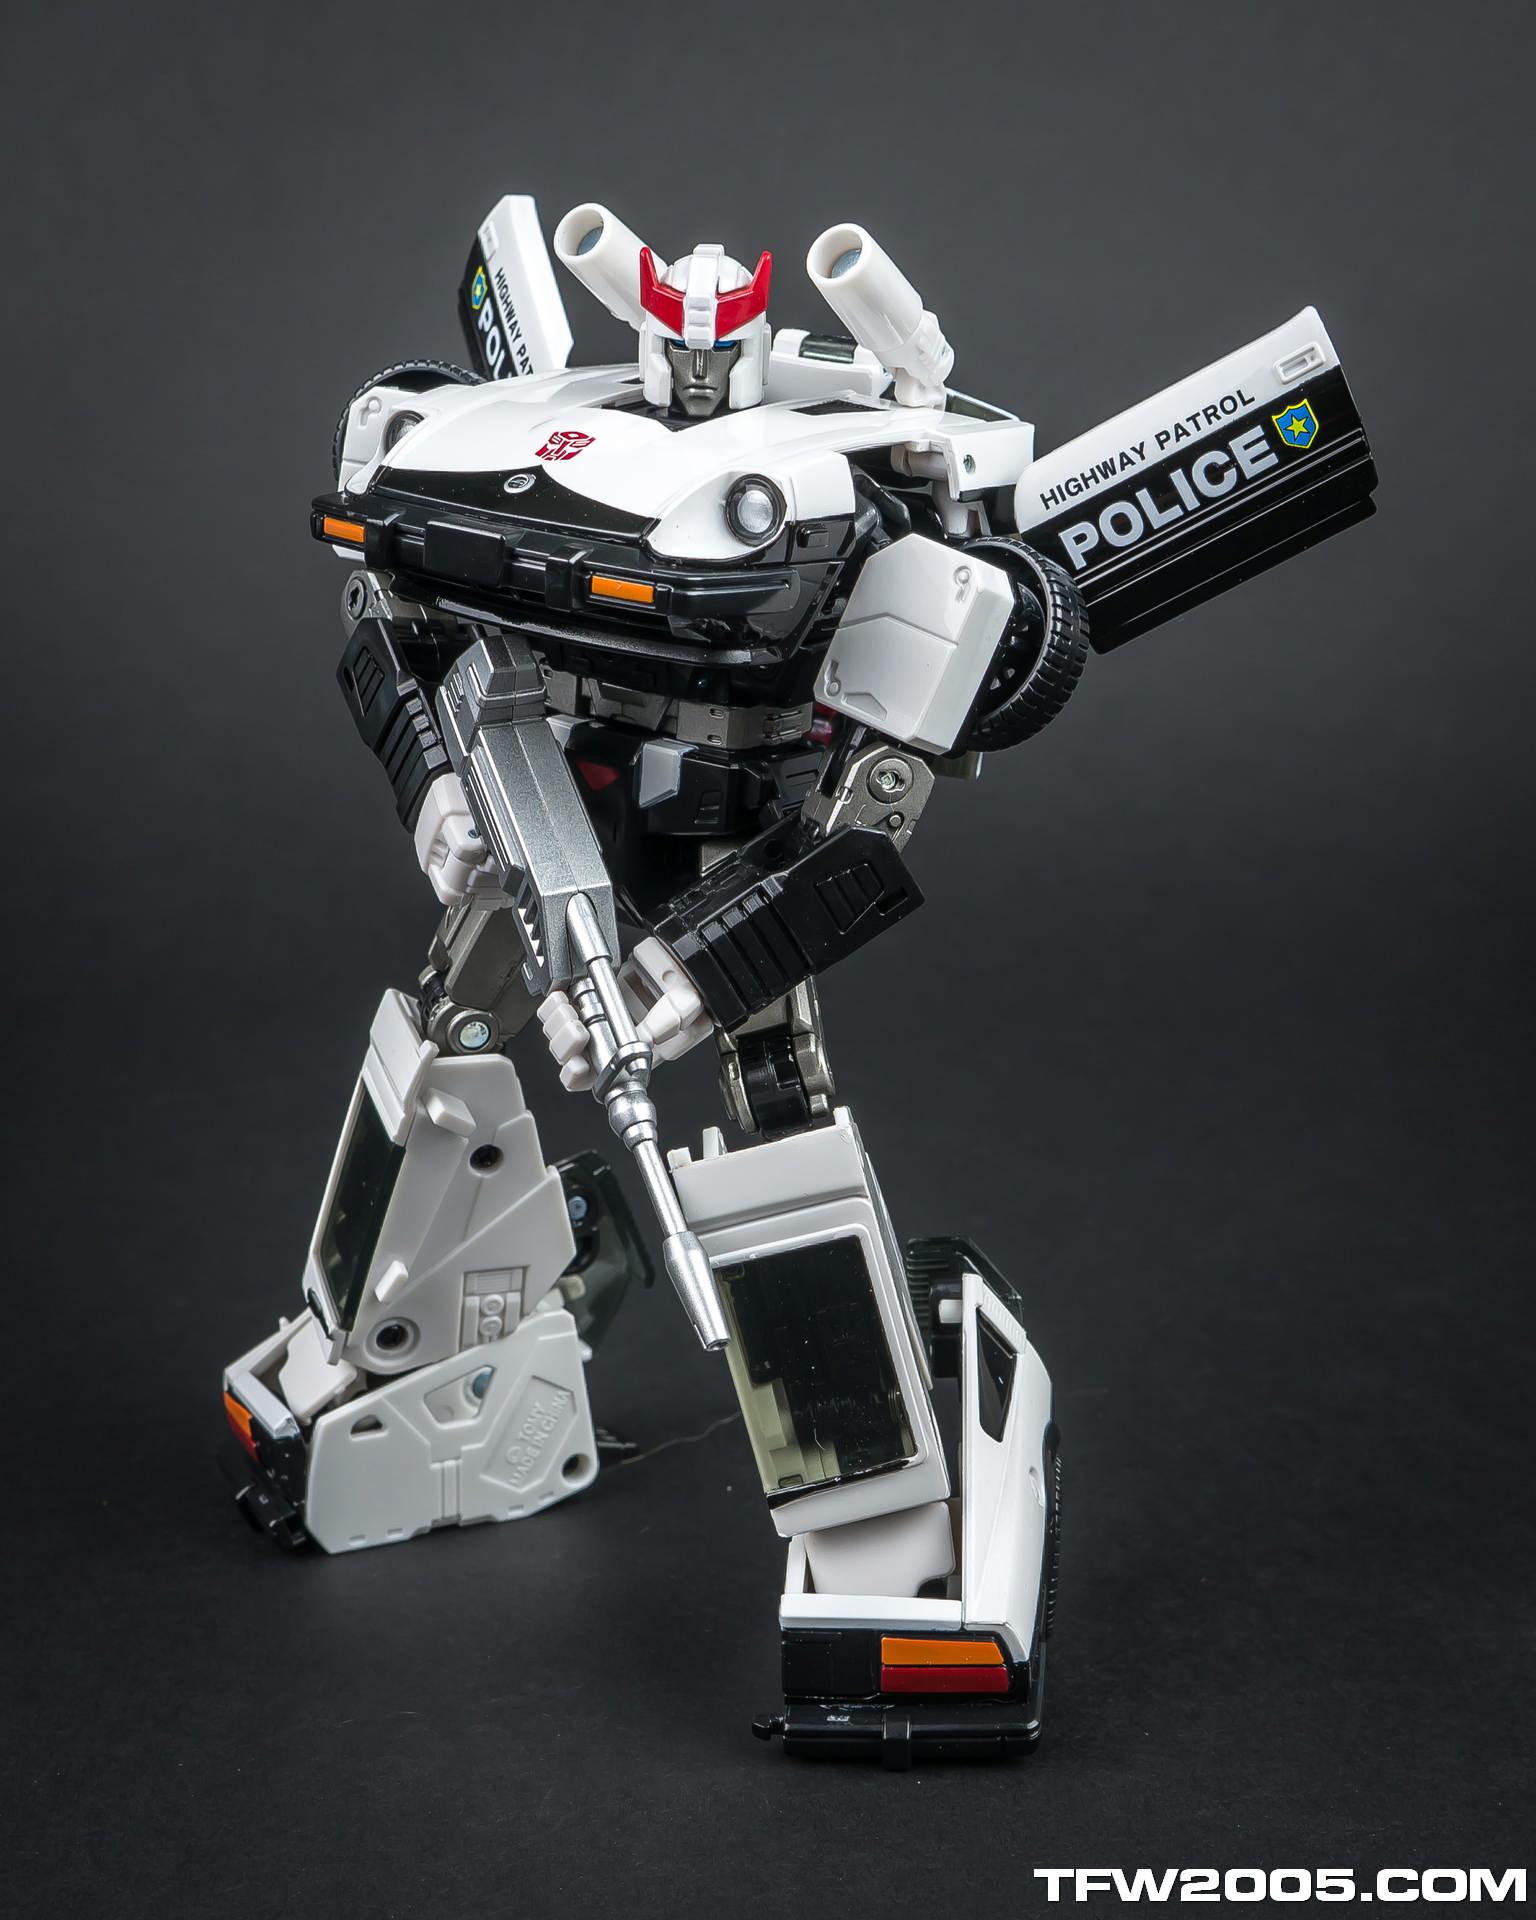 Transformers masterpiece prowl